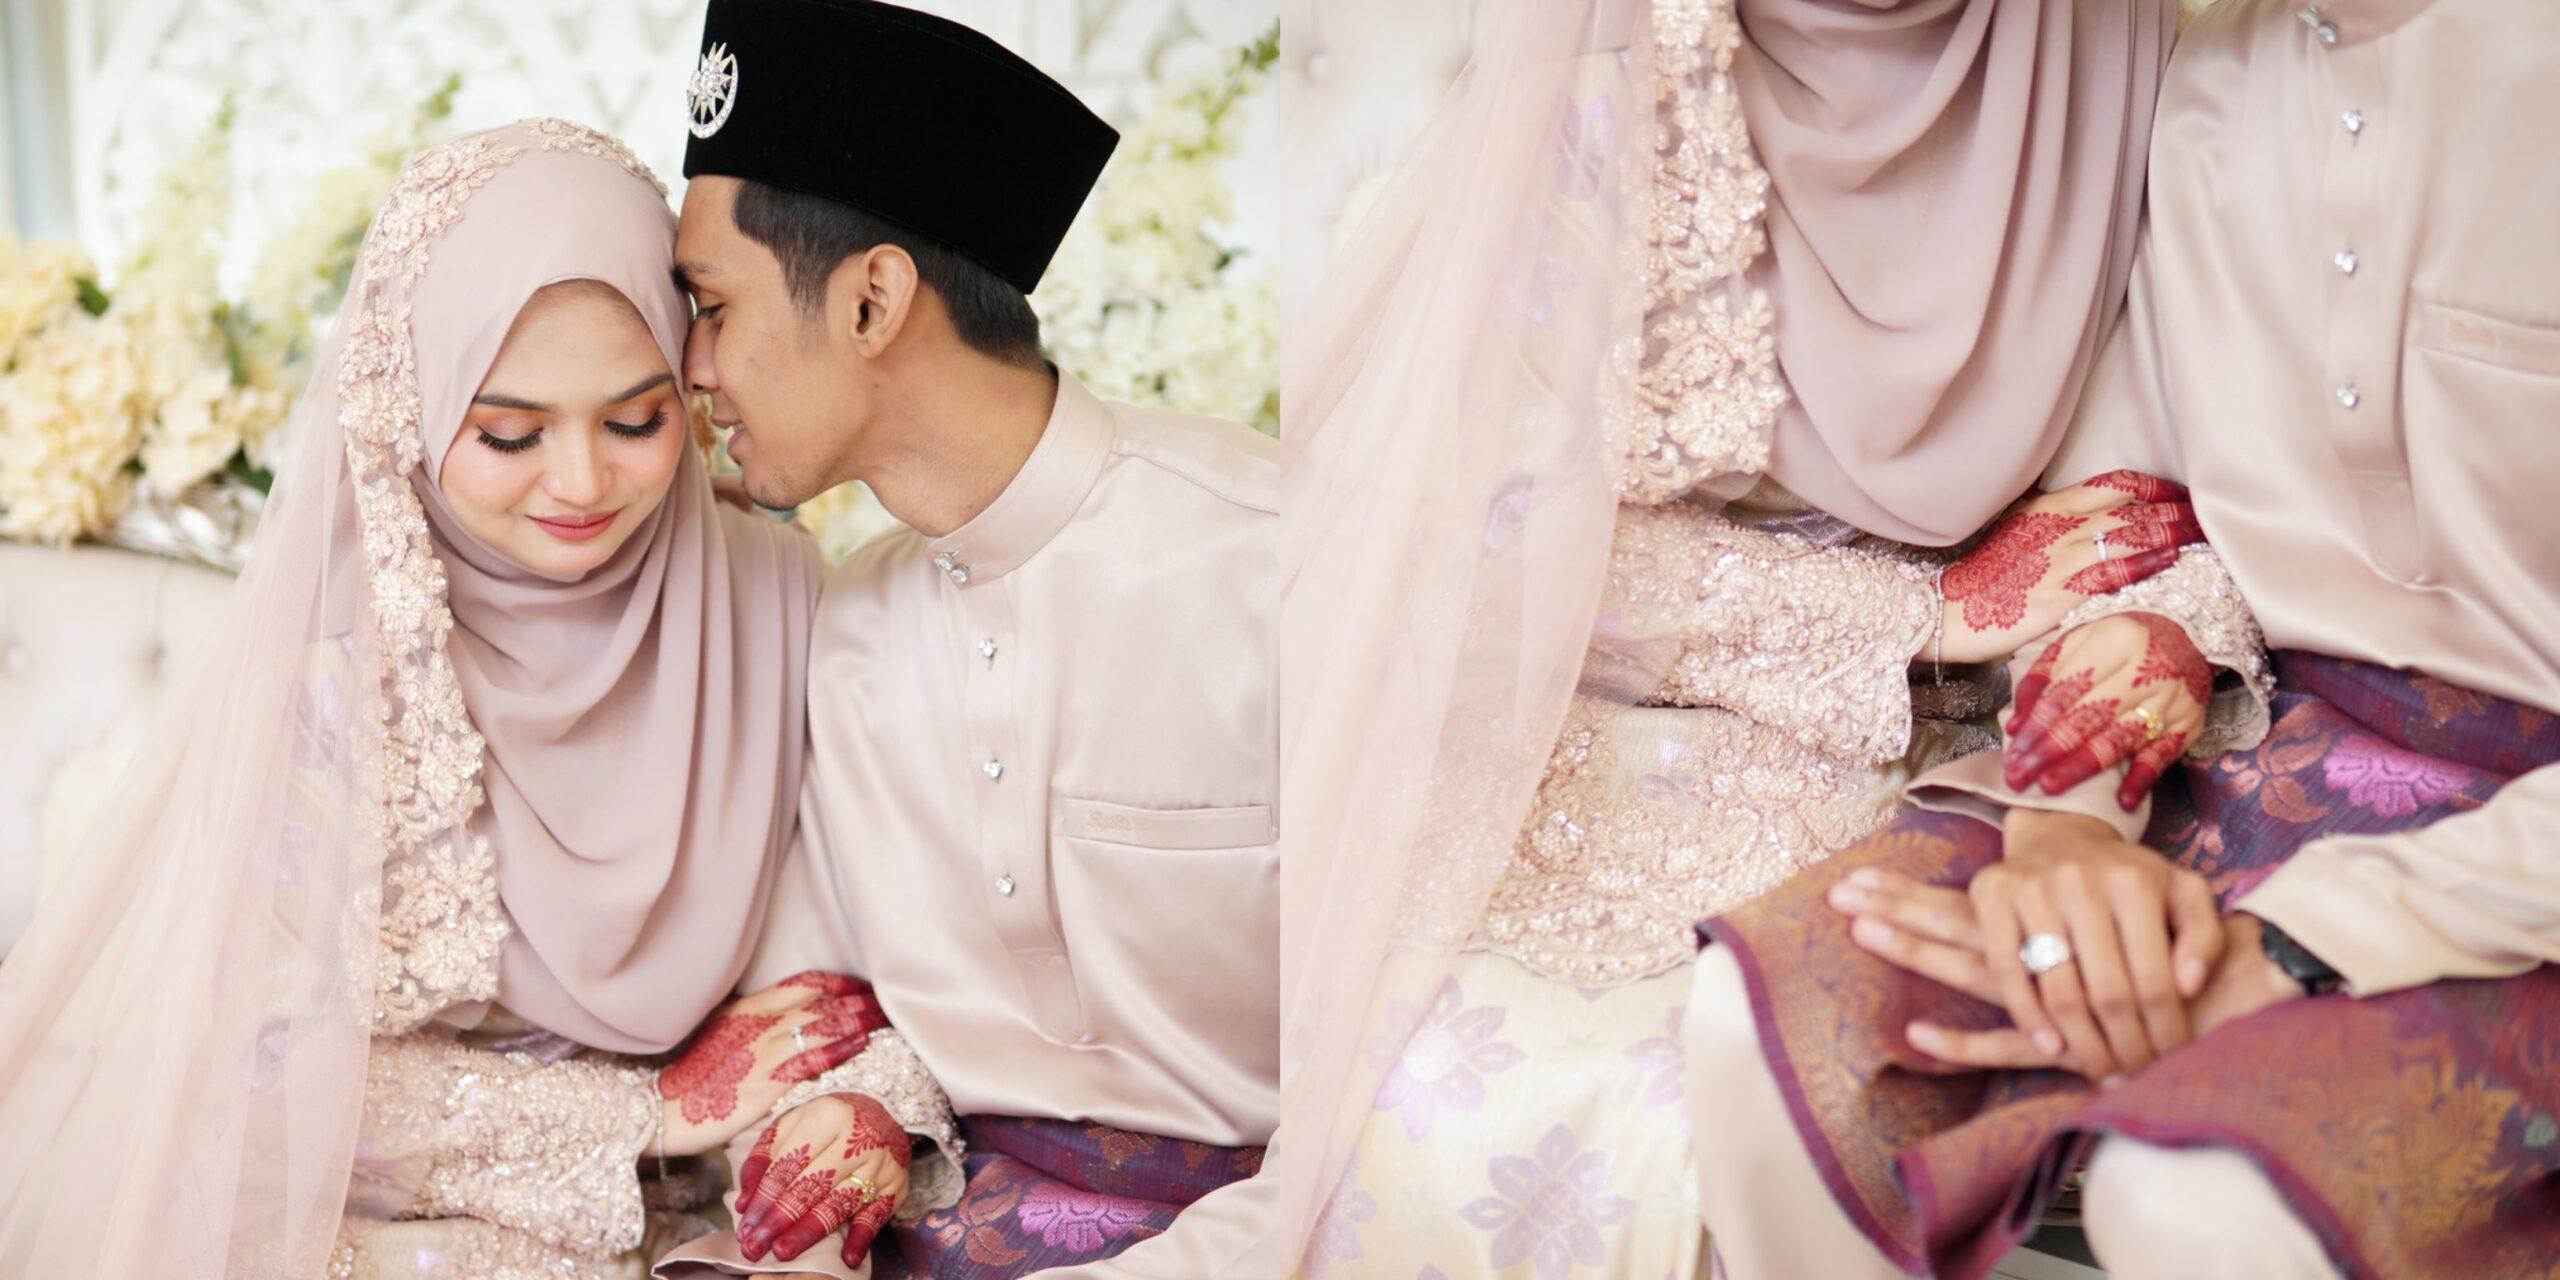 7 Tahun Kenal, Pengantin Ini First Time Nyanyi Depan Isteri Di Hari Perkahwinan